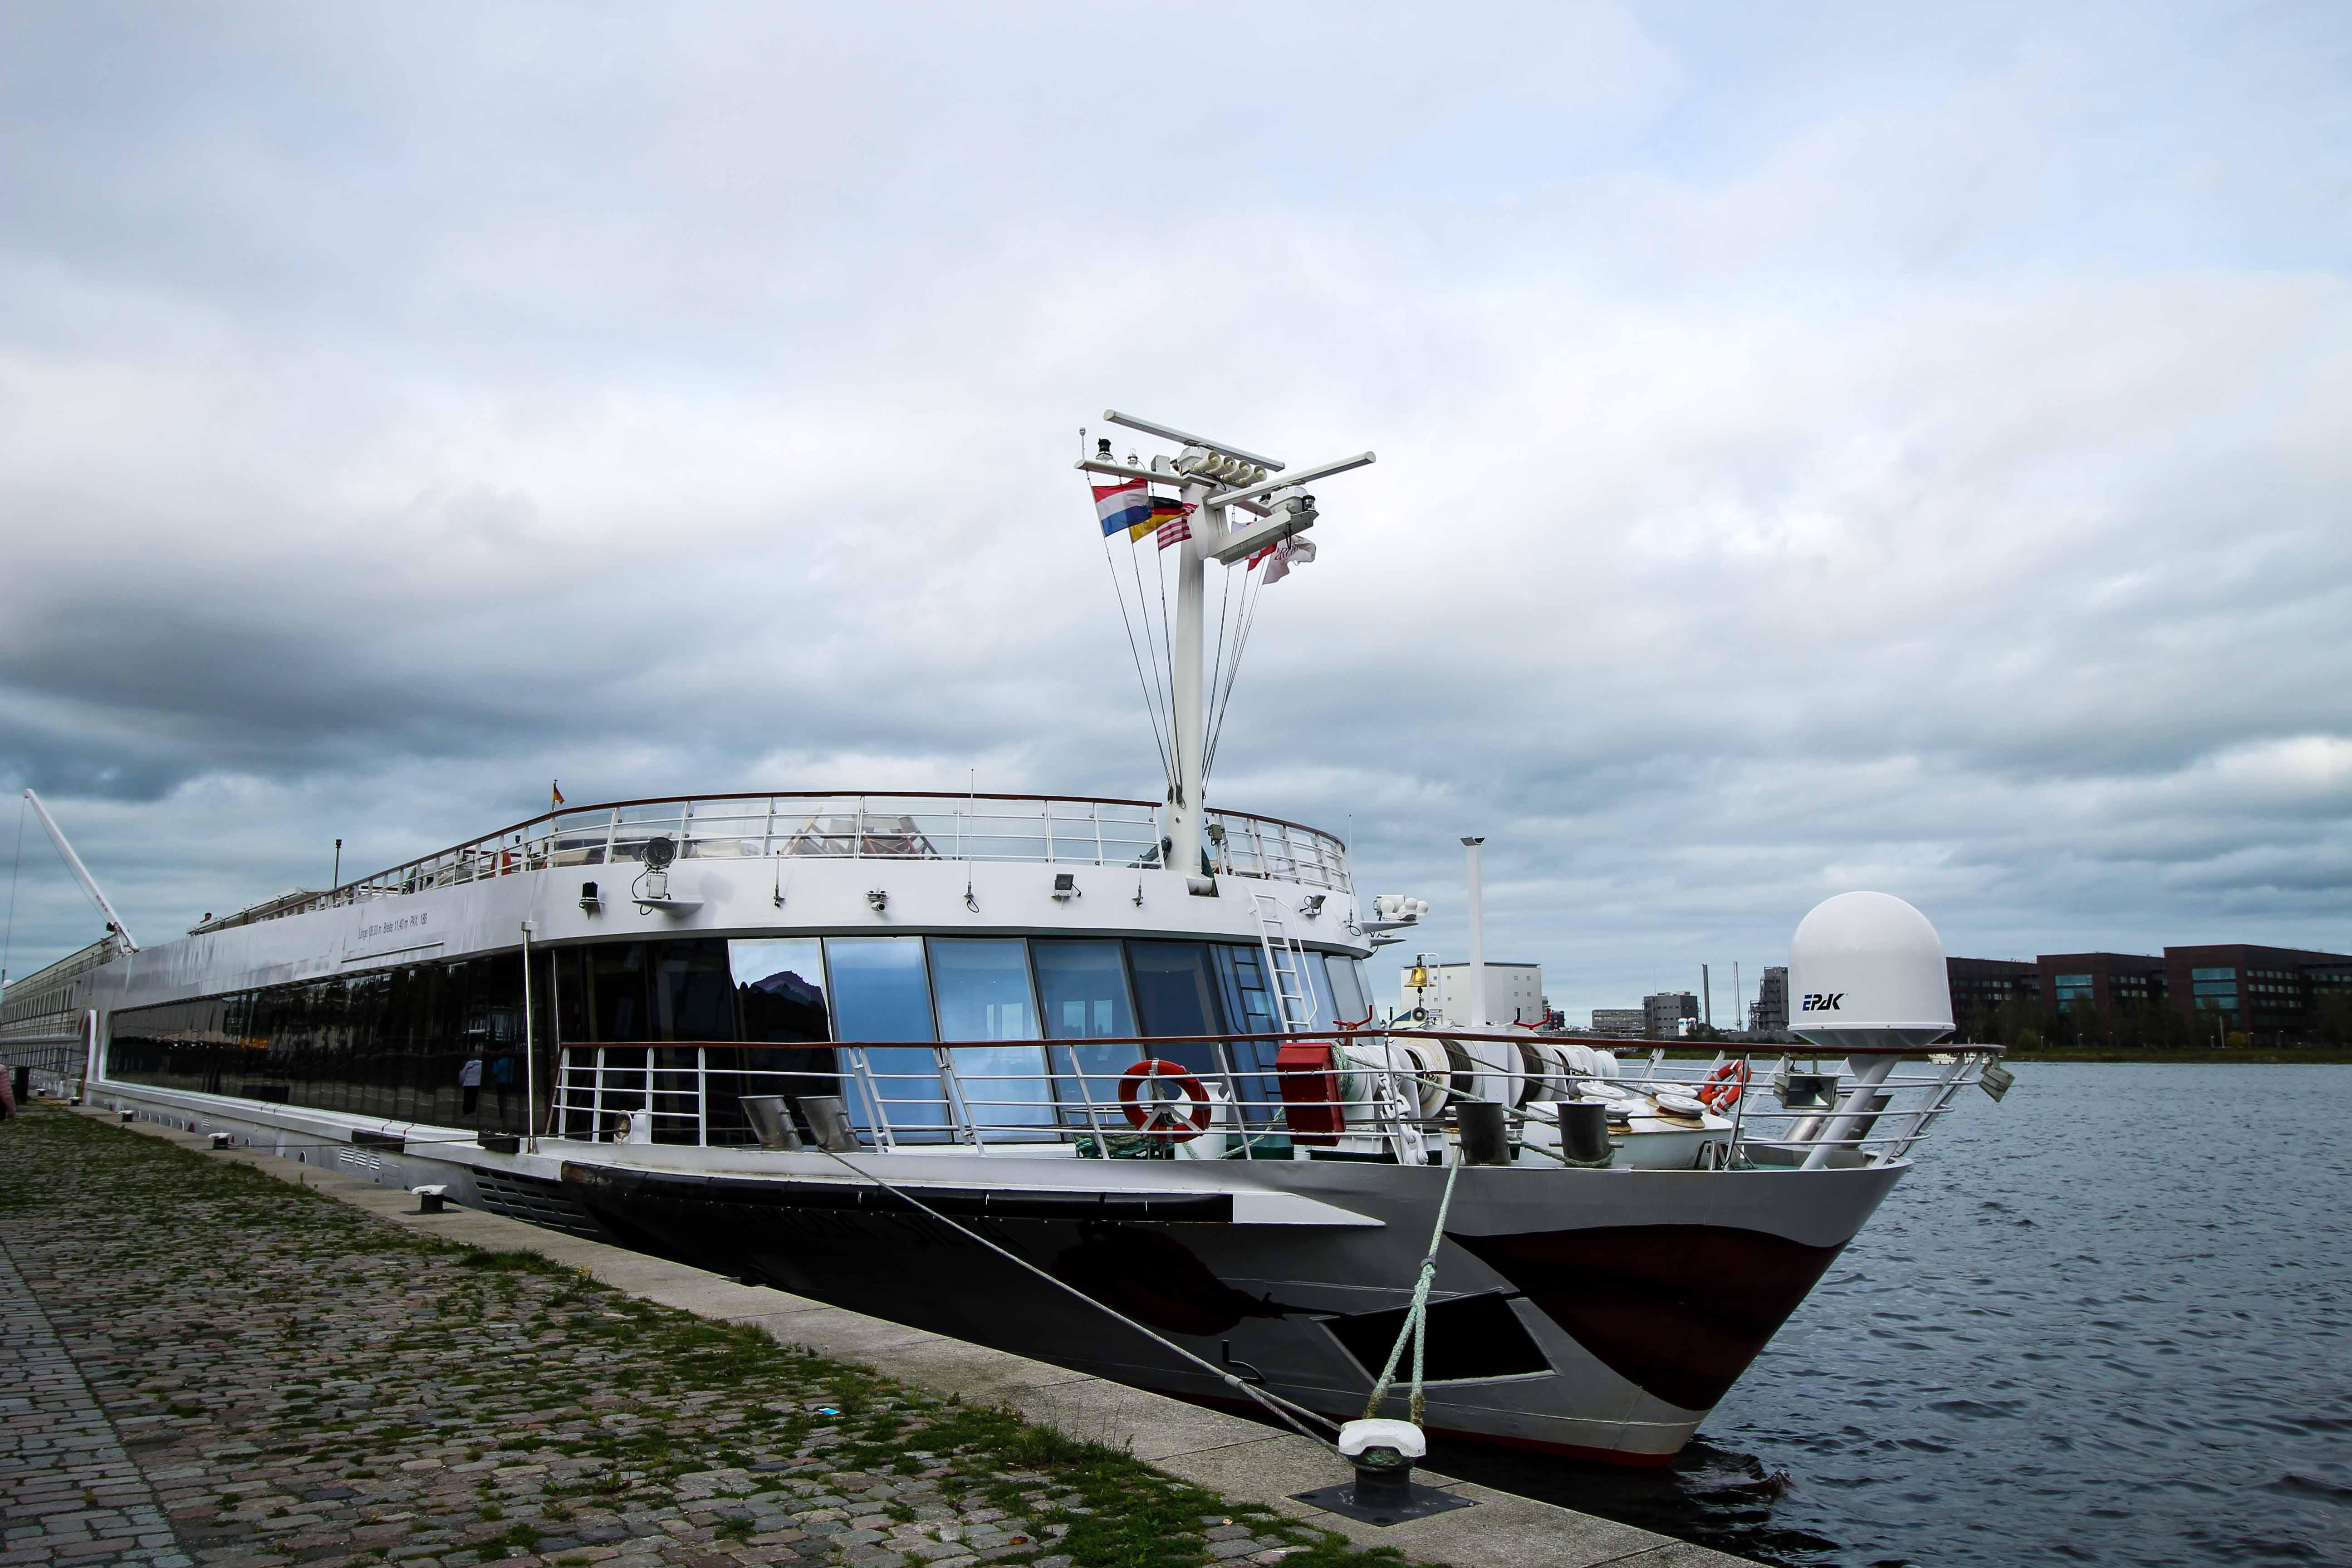 Flusskreuzfahrt A-ROSA SILVA Kreuzfahrtschiff Rhein Erlebnis Kurs Amsterdam Erfahrung Roterdam Flusskreuzfahrt Reiseblog